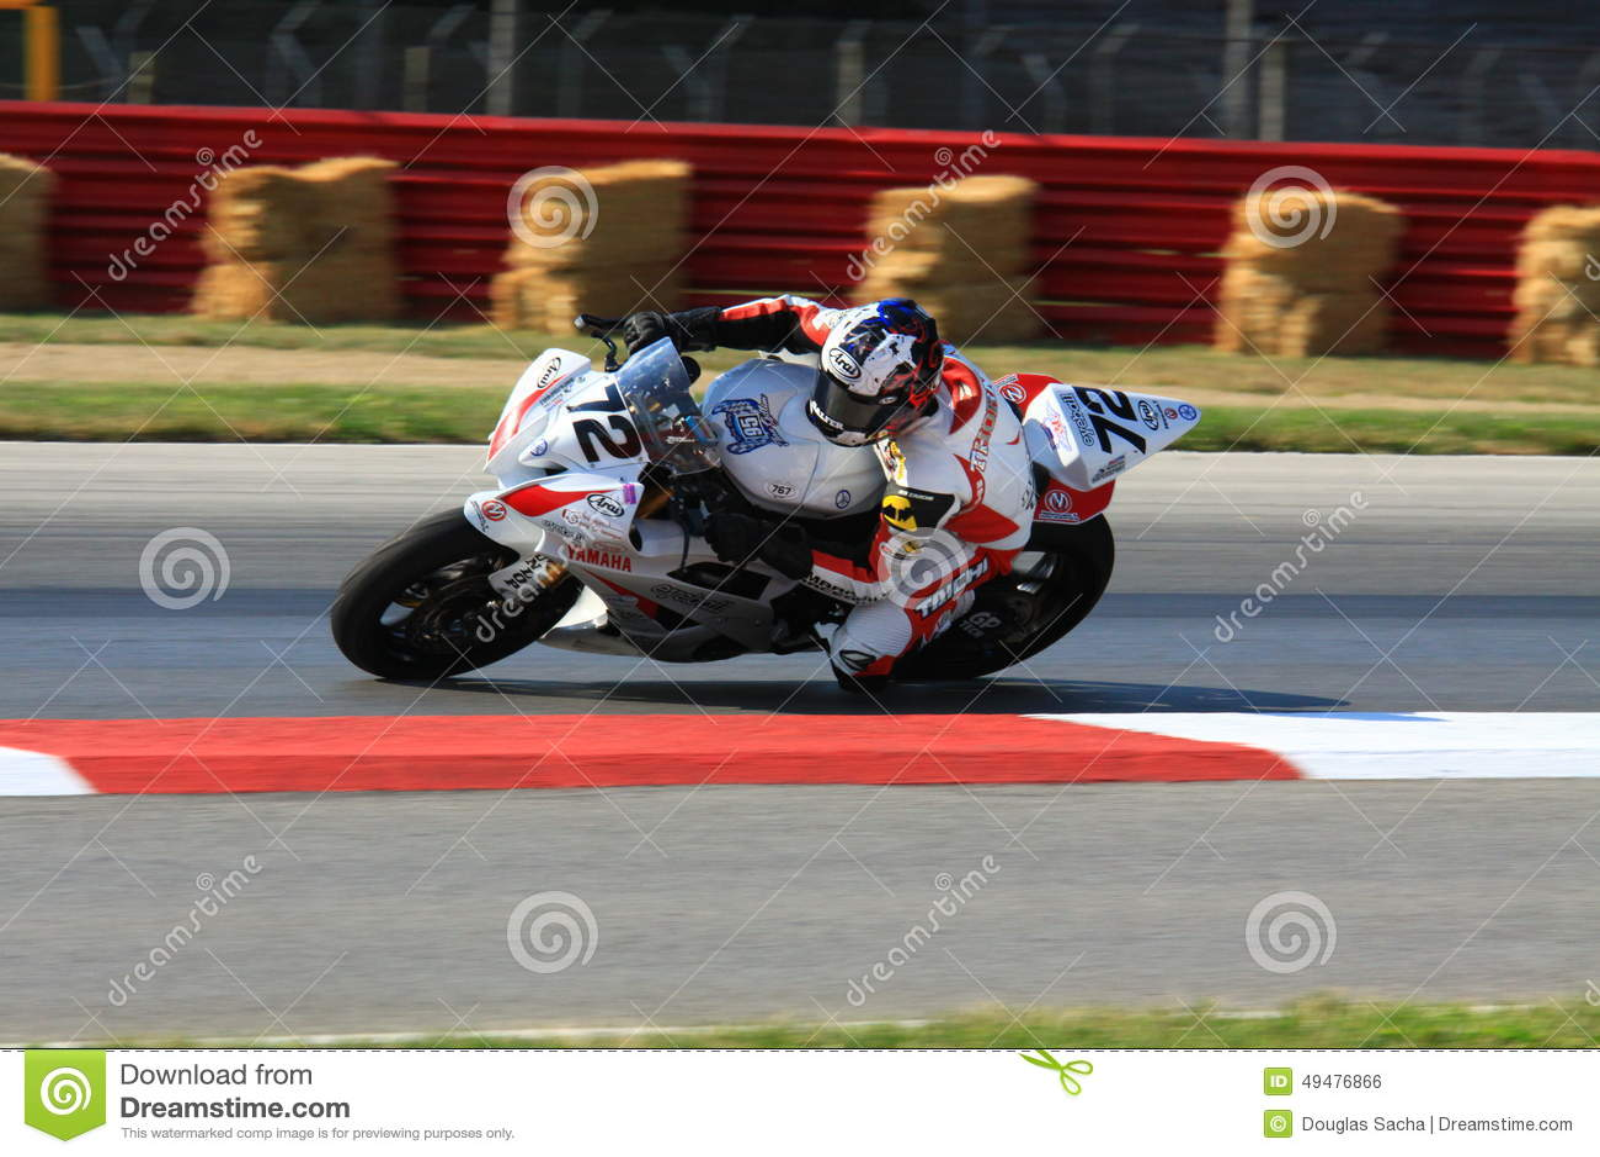 Yamaha YZF-R6 race motorcycle